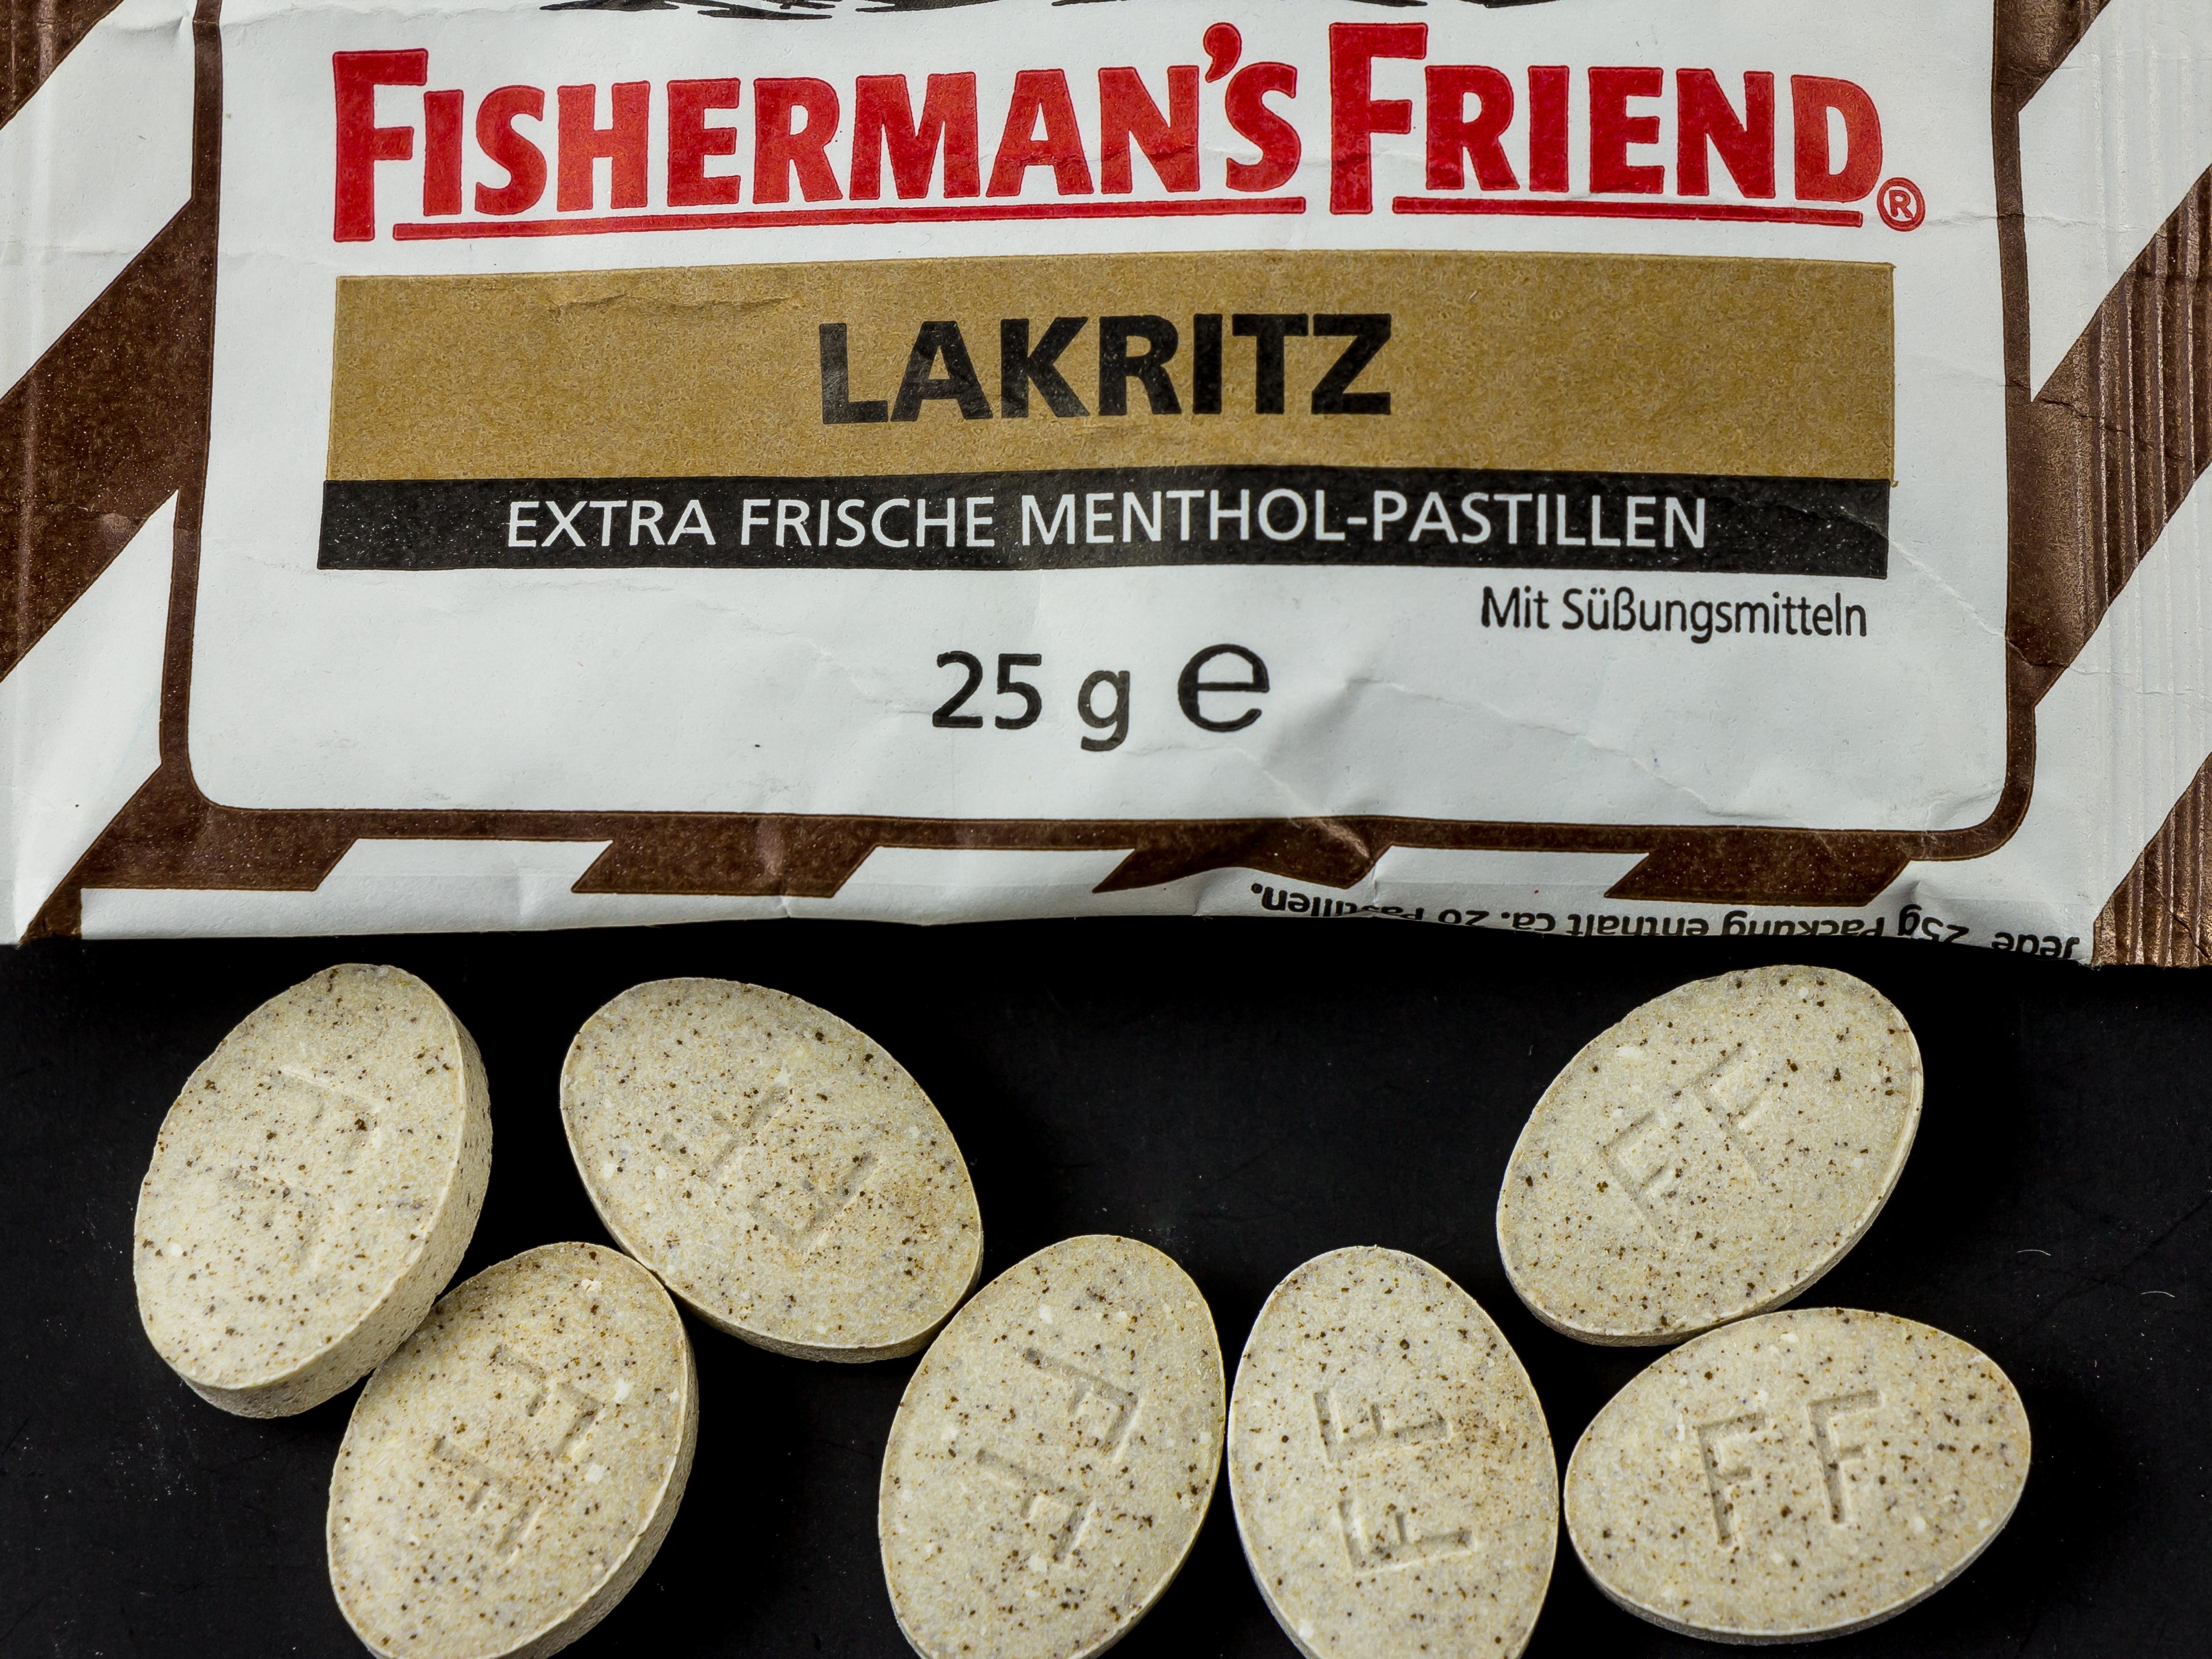 File:Fisherman's Friend - Lakritz-1286.jpg